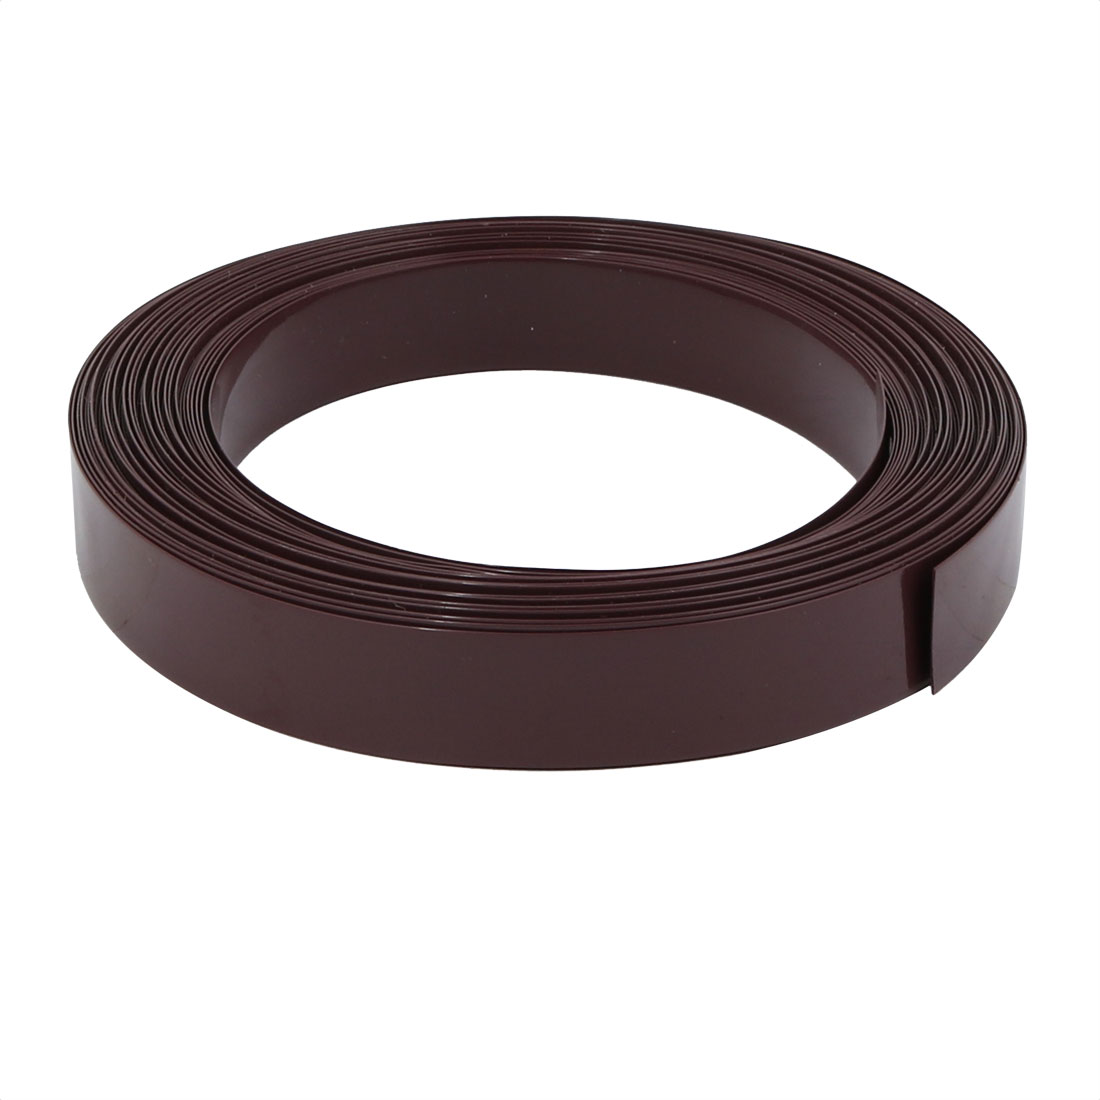 12mm Flat Width 10 Meter Long PVC Heat Shrinkable Tube Brown for Battery Pack